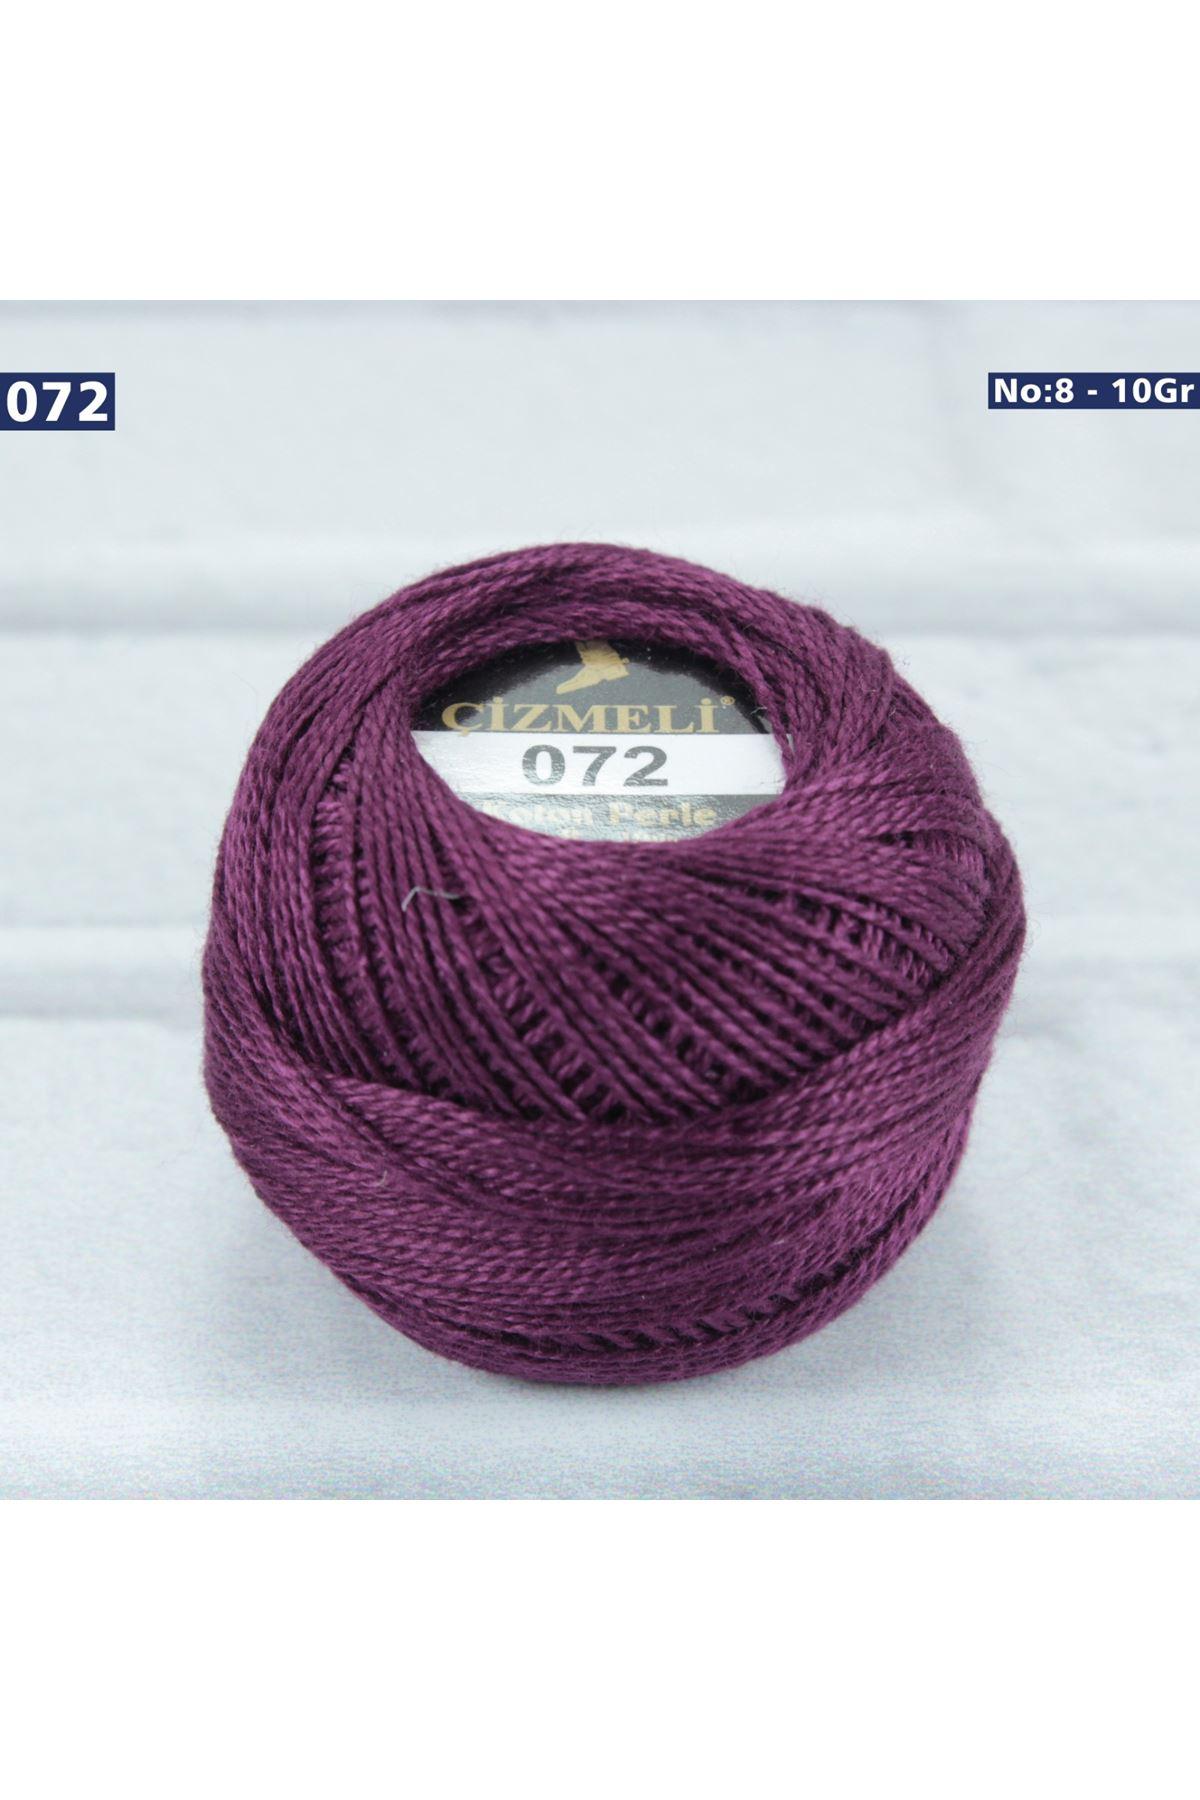 Çizmeli Cotton Perle Nakış İpliği No: 072